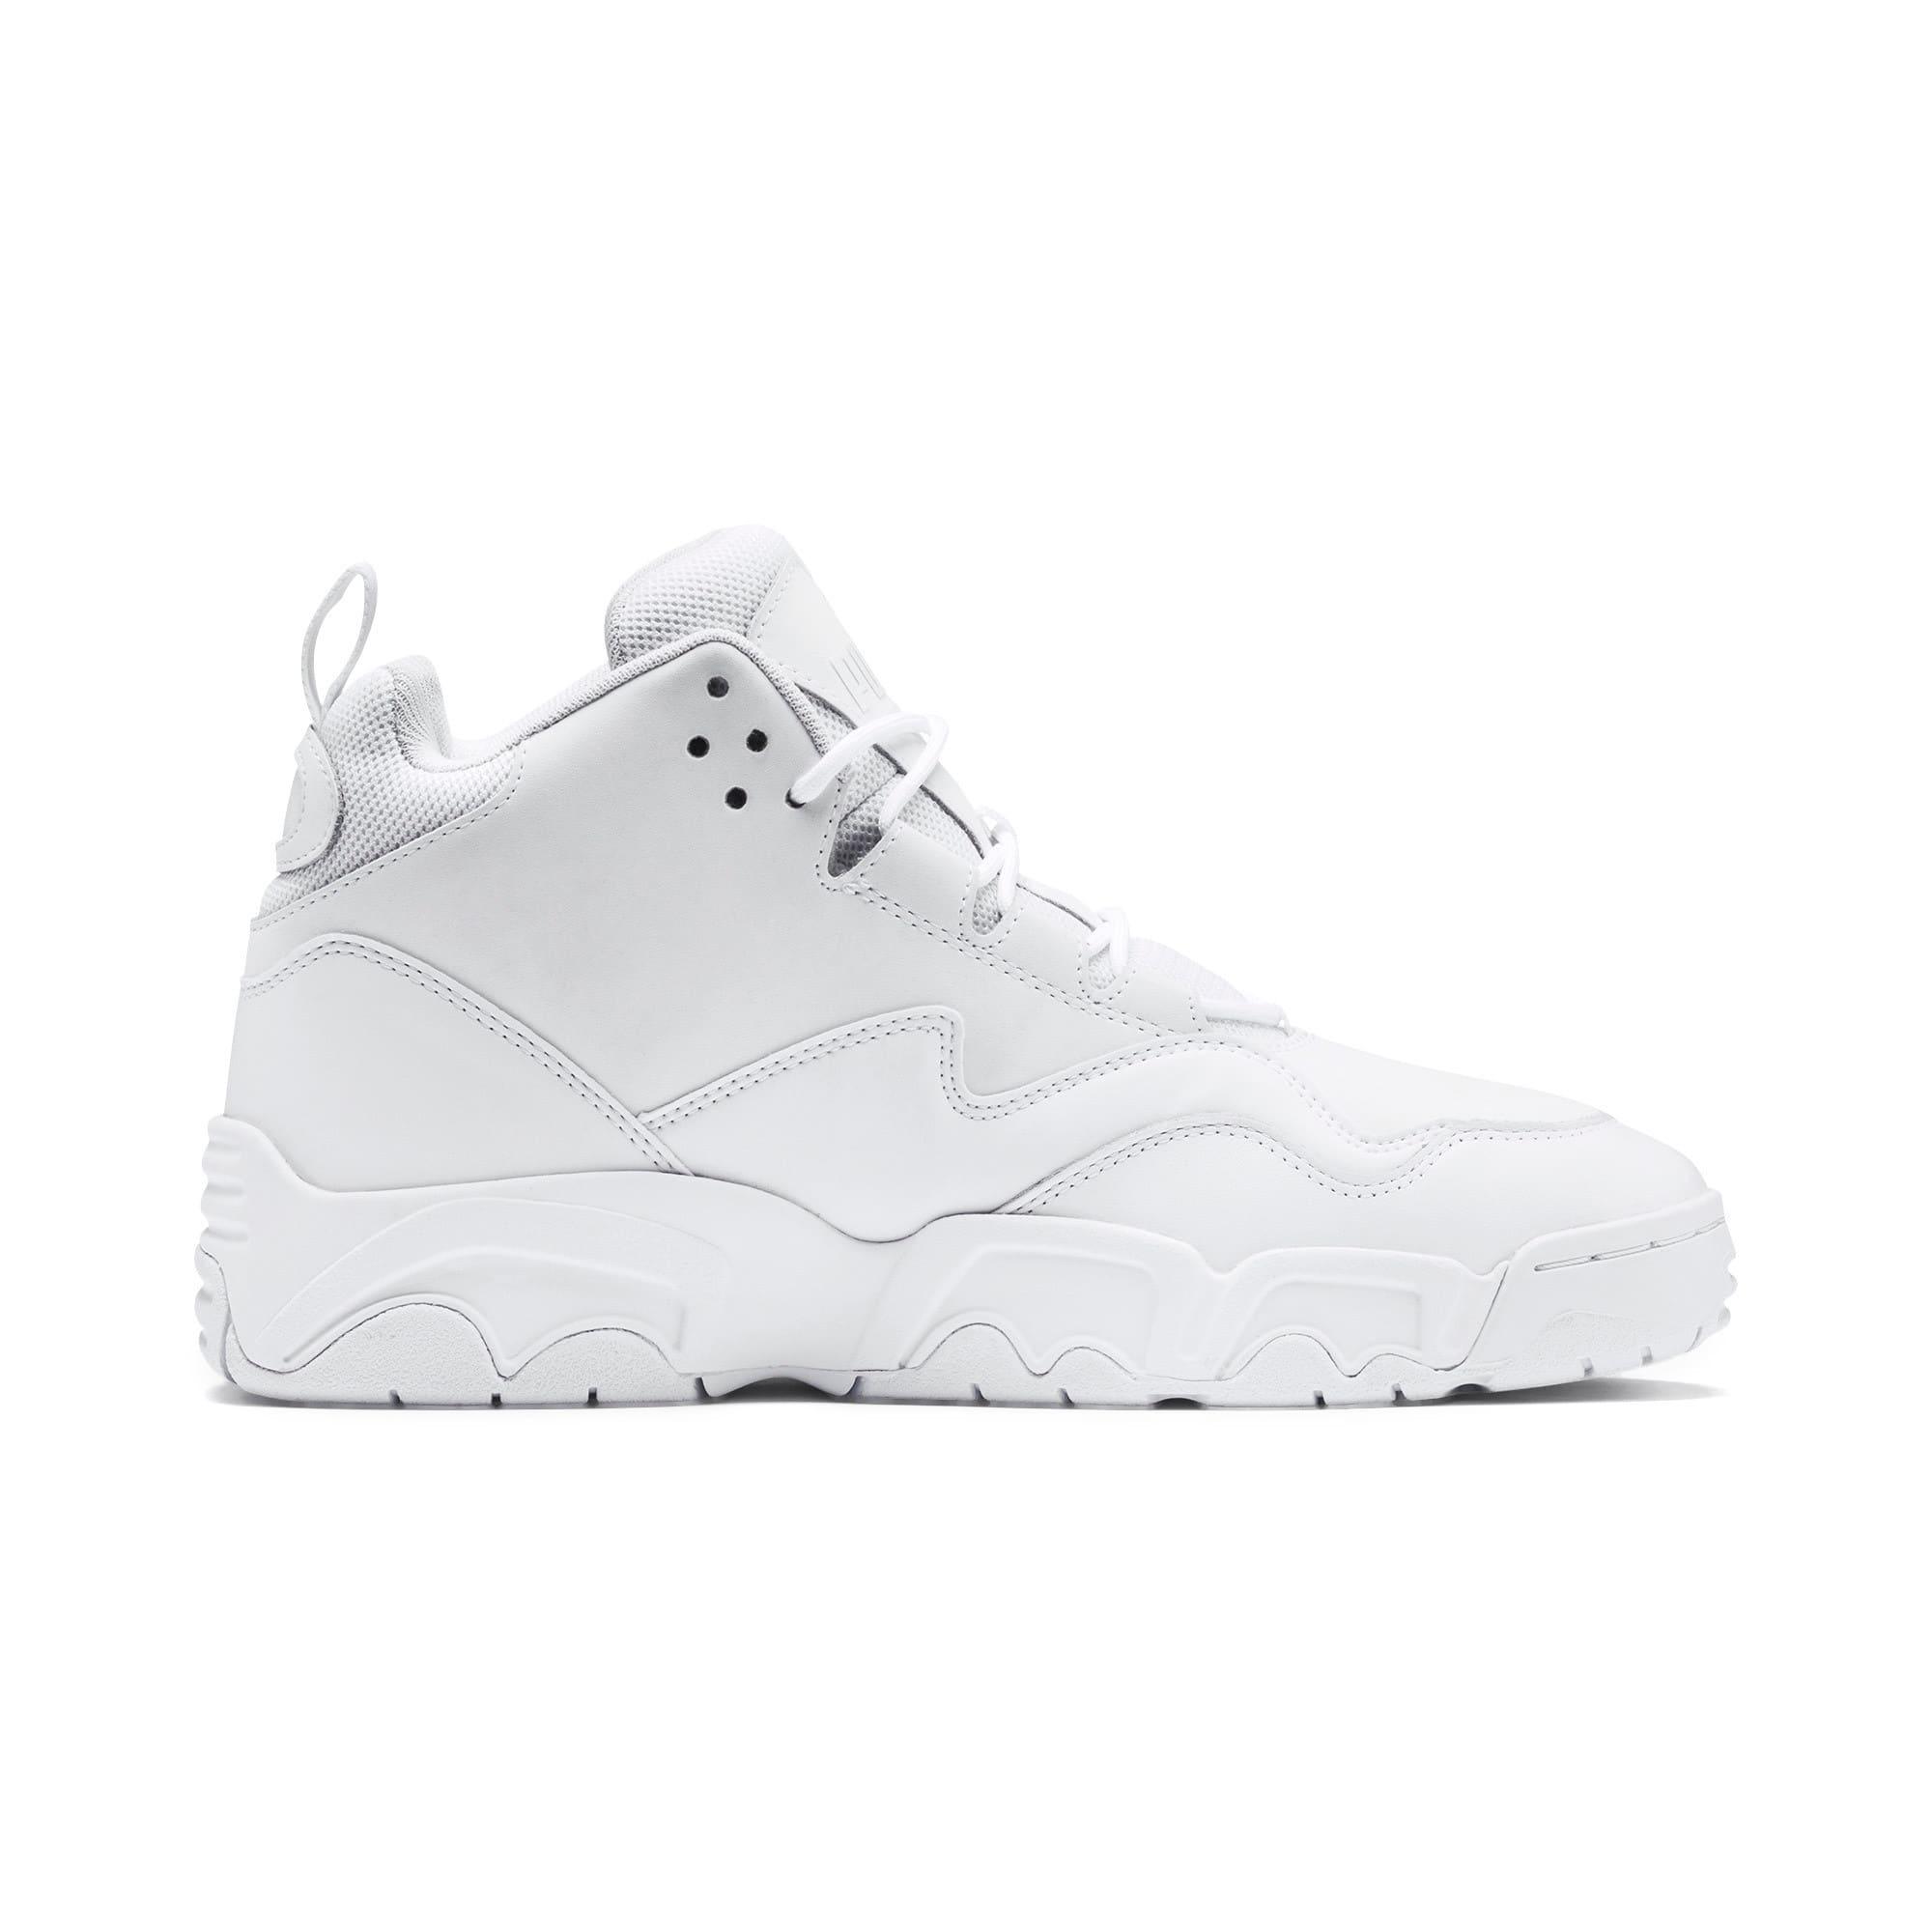 Thumbnail 5 of Source Mid Sneakers, Puma Black-Puma White, medium